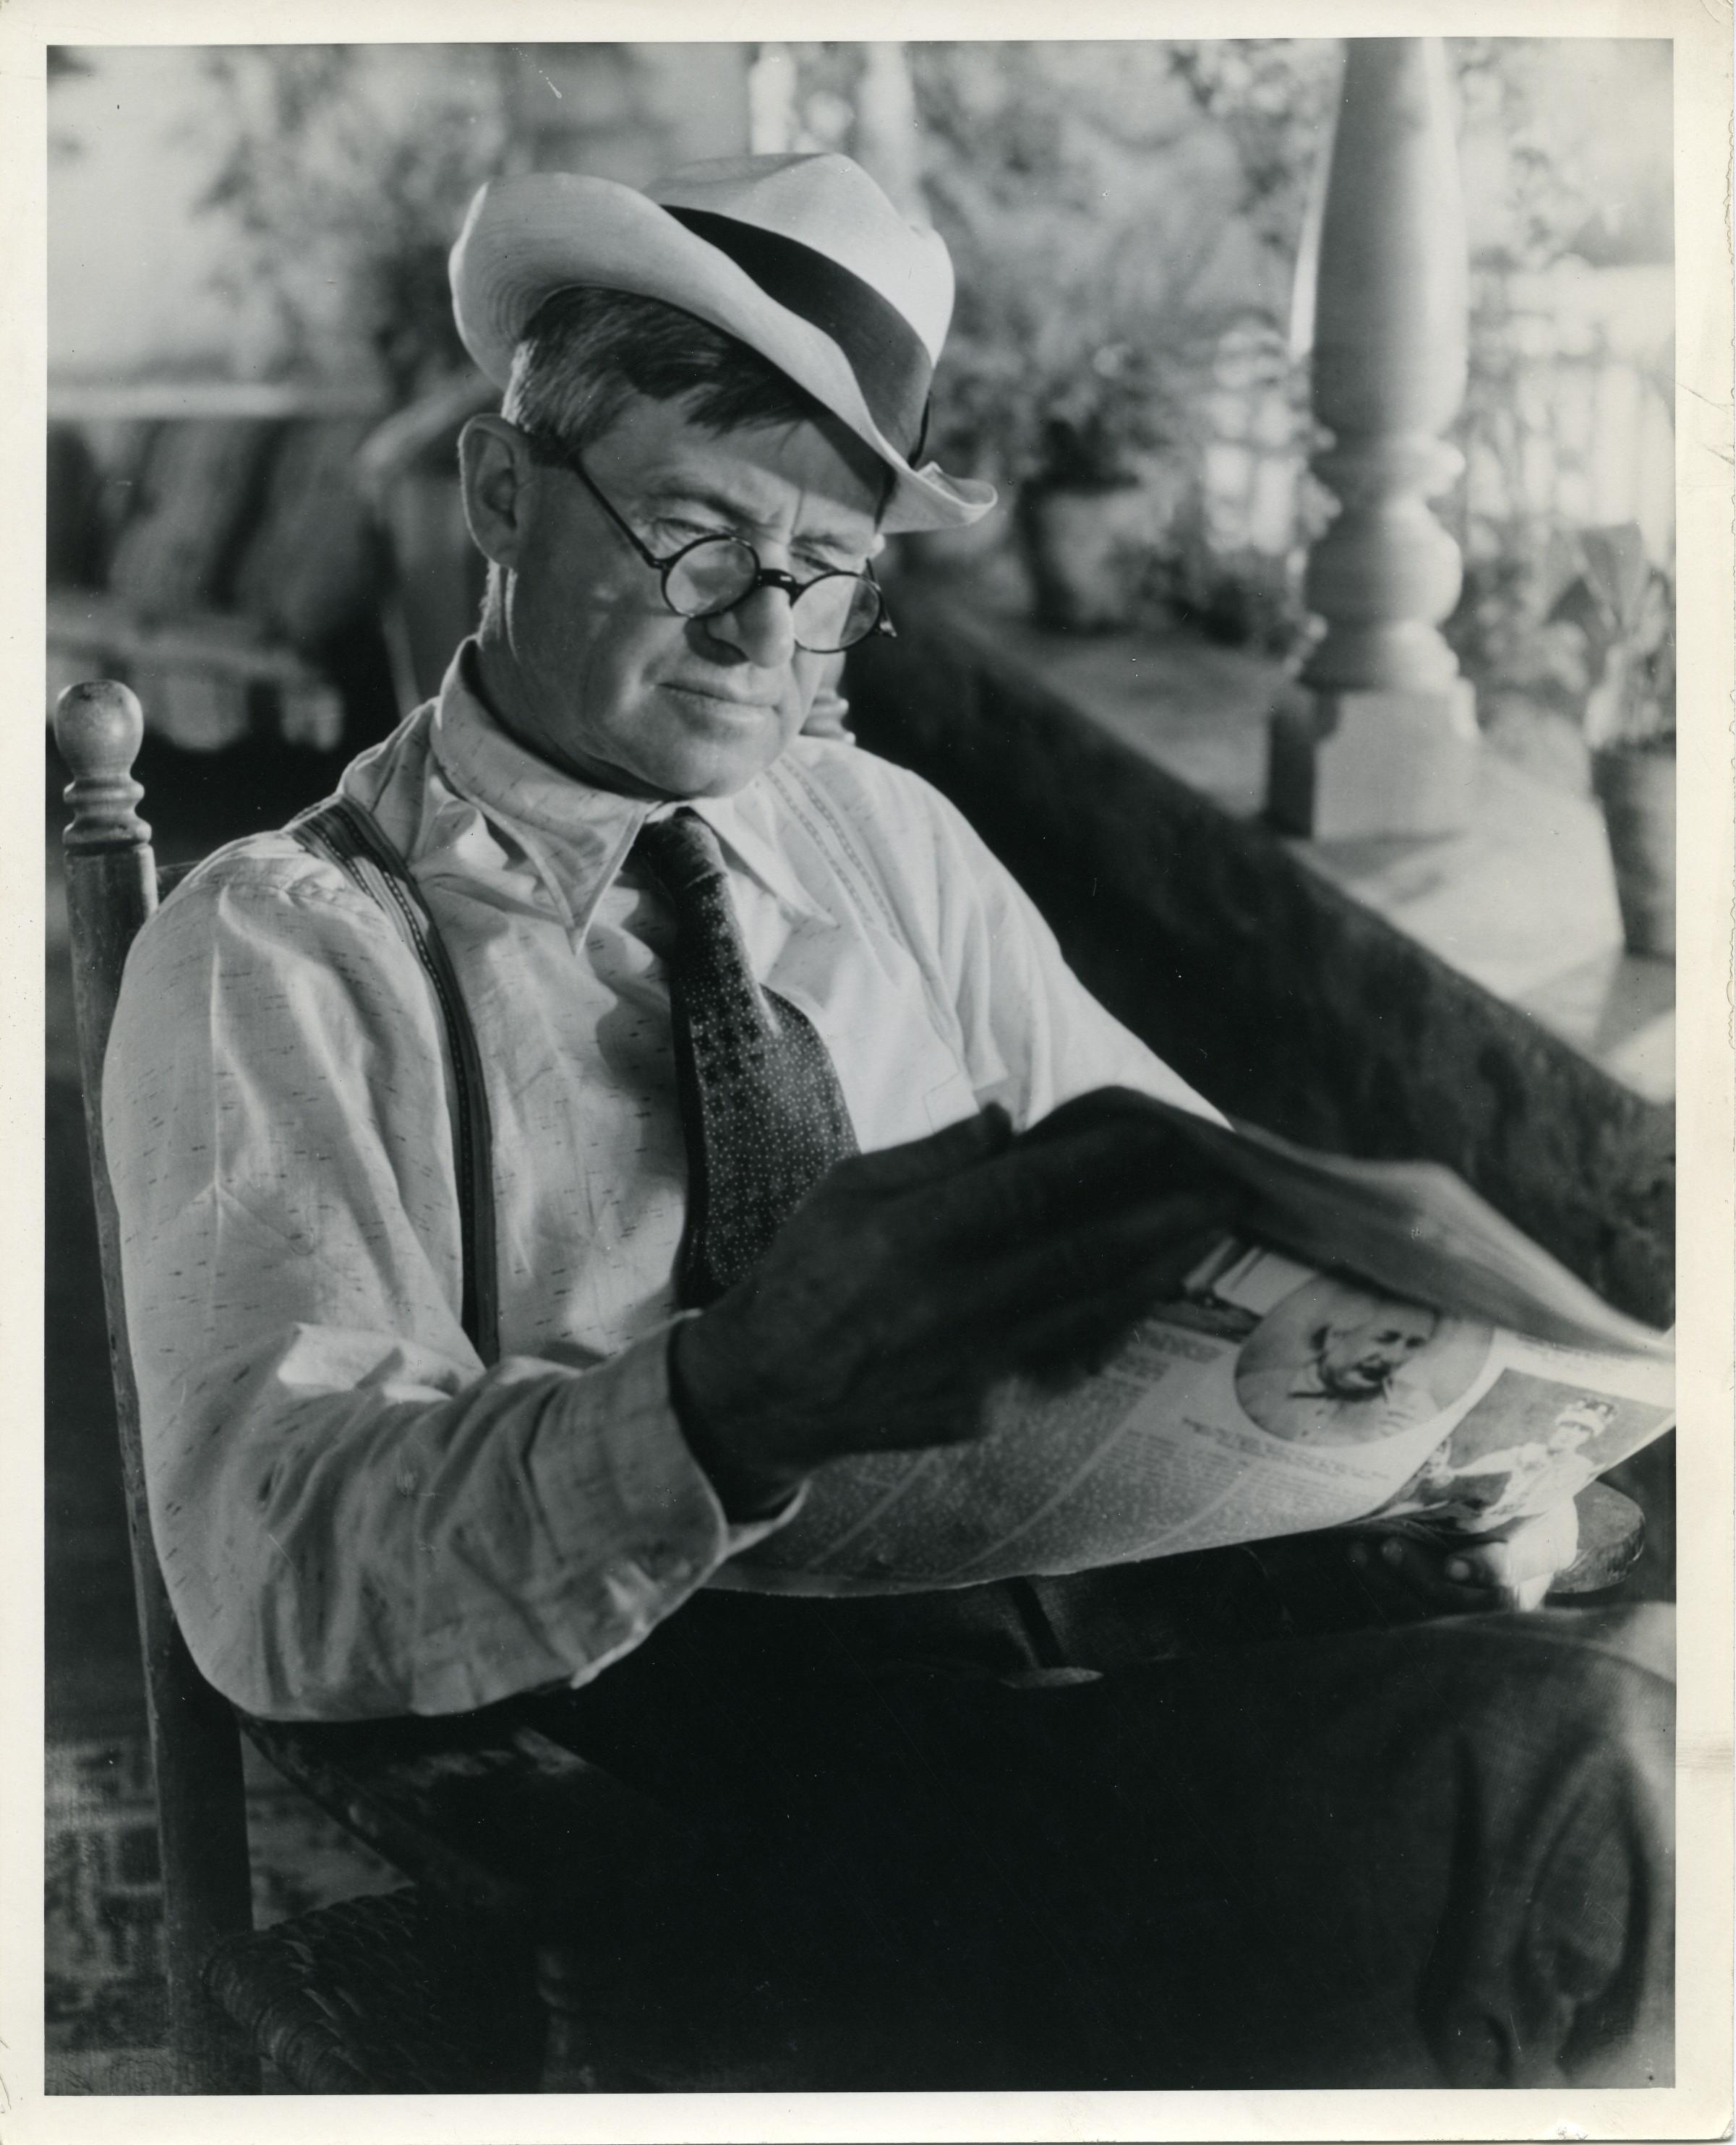 Rogers_Will_Folder_1_1928-1935_002.jpg